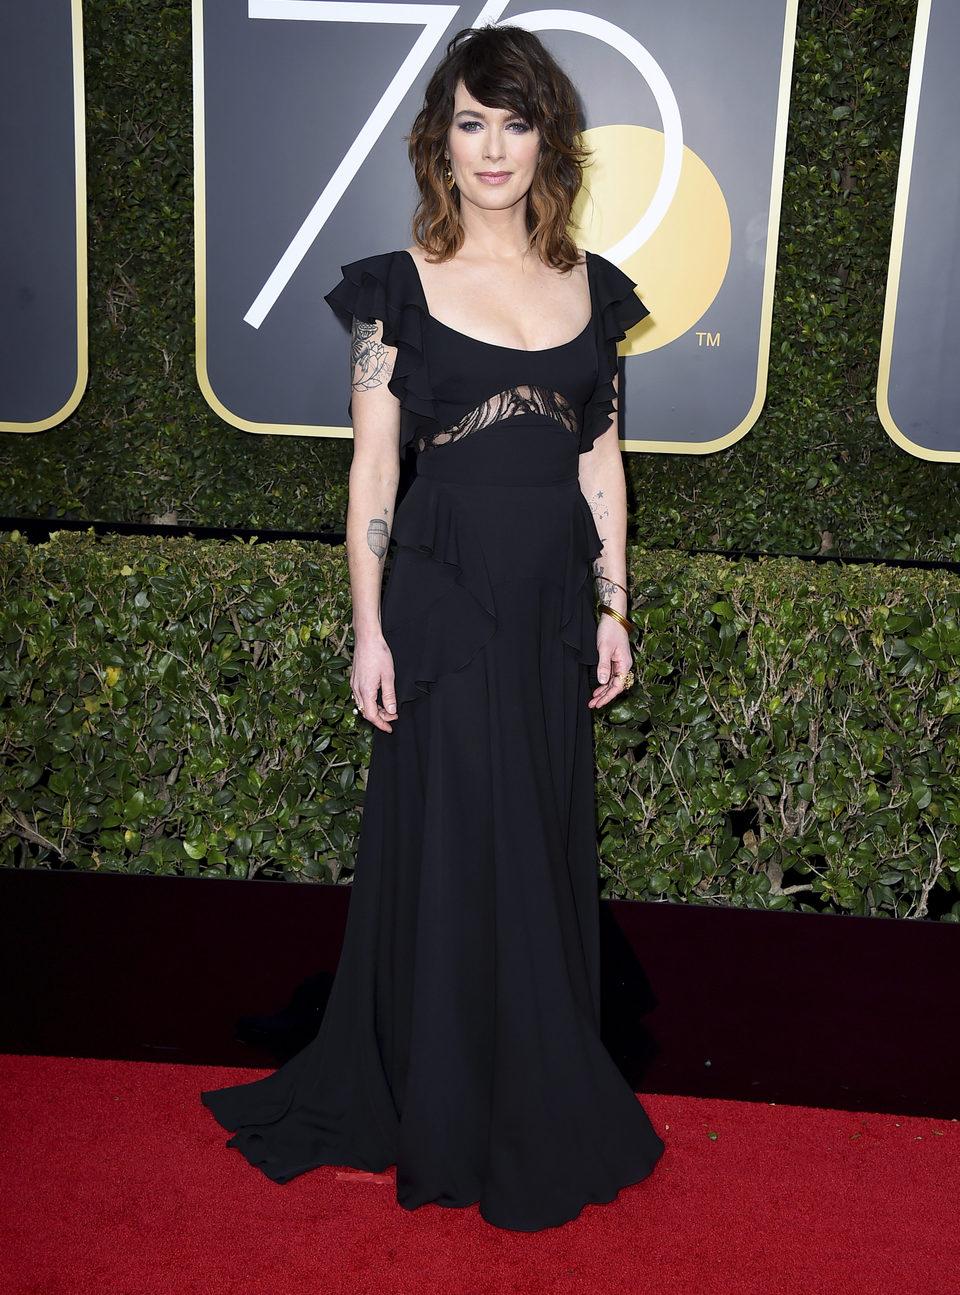 Lena Headey at the Golden Globes 2018 red carpet